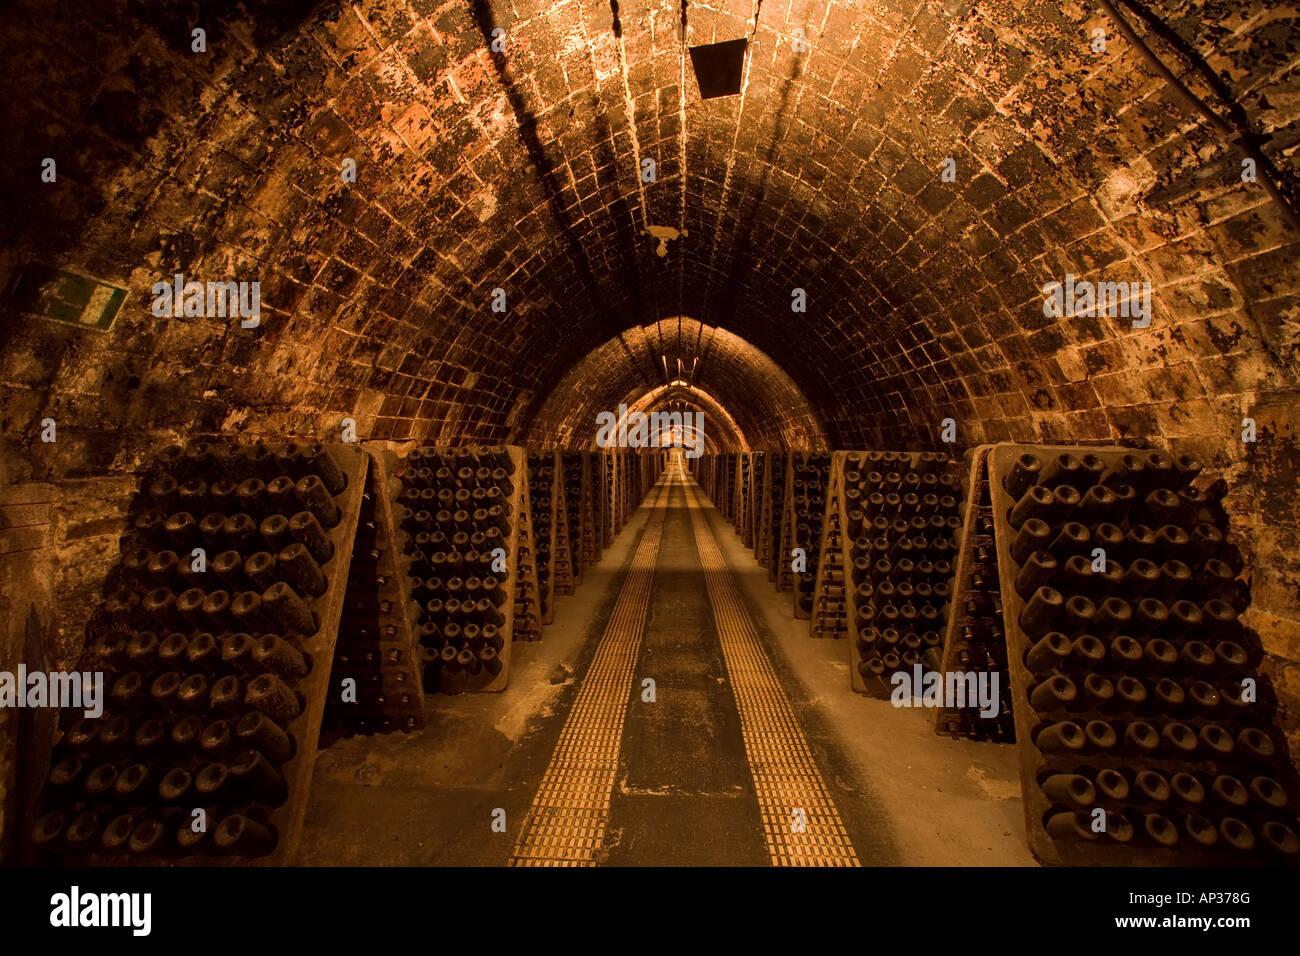 Codorniu cava cellars sant sadurni d anoia near barcelona spain stock photo royalty free - Muebles sant sadurni d anoia ...